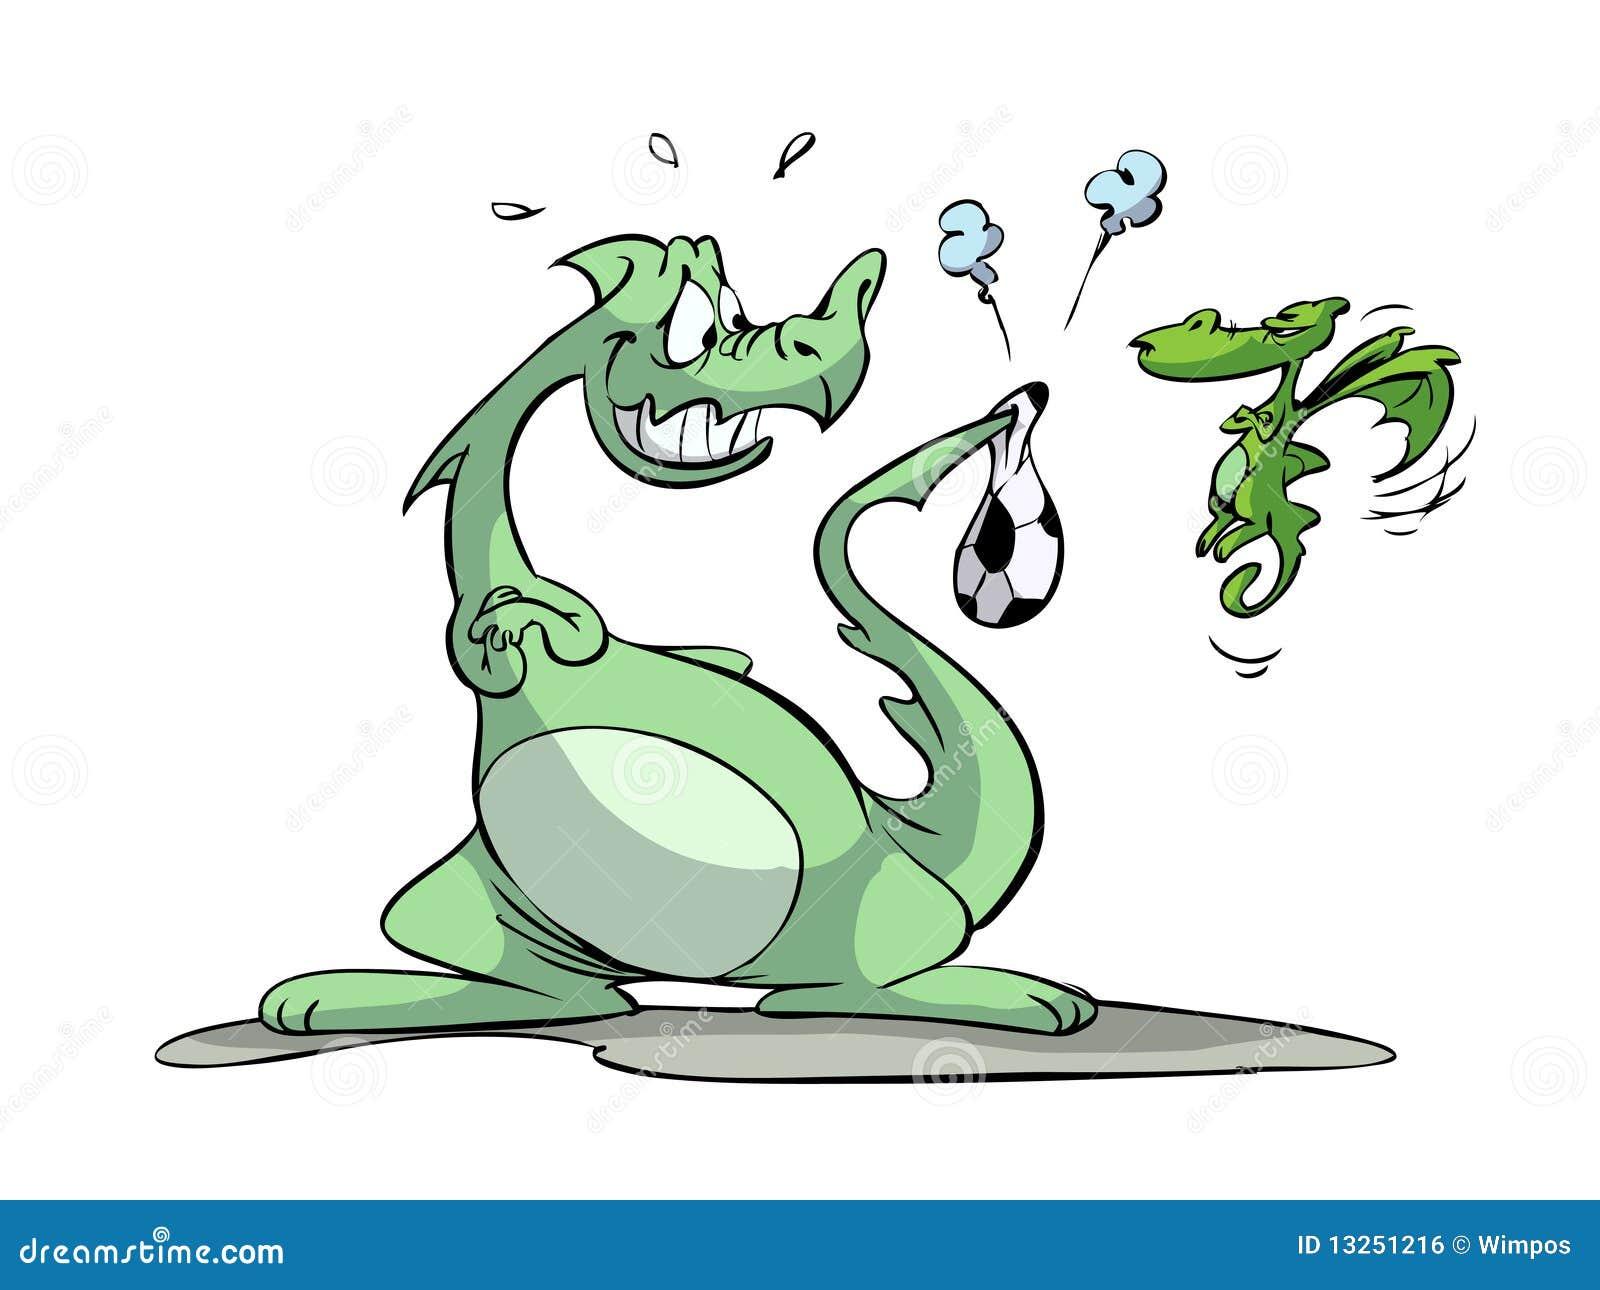 Dragon and soccer ball stock vector. Illustration of magic - 20442264